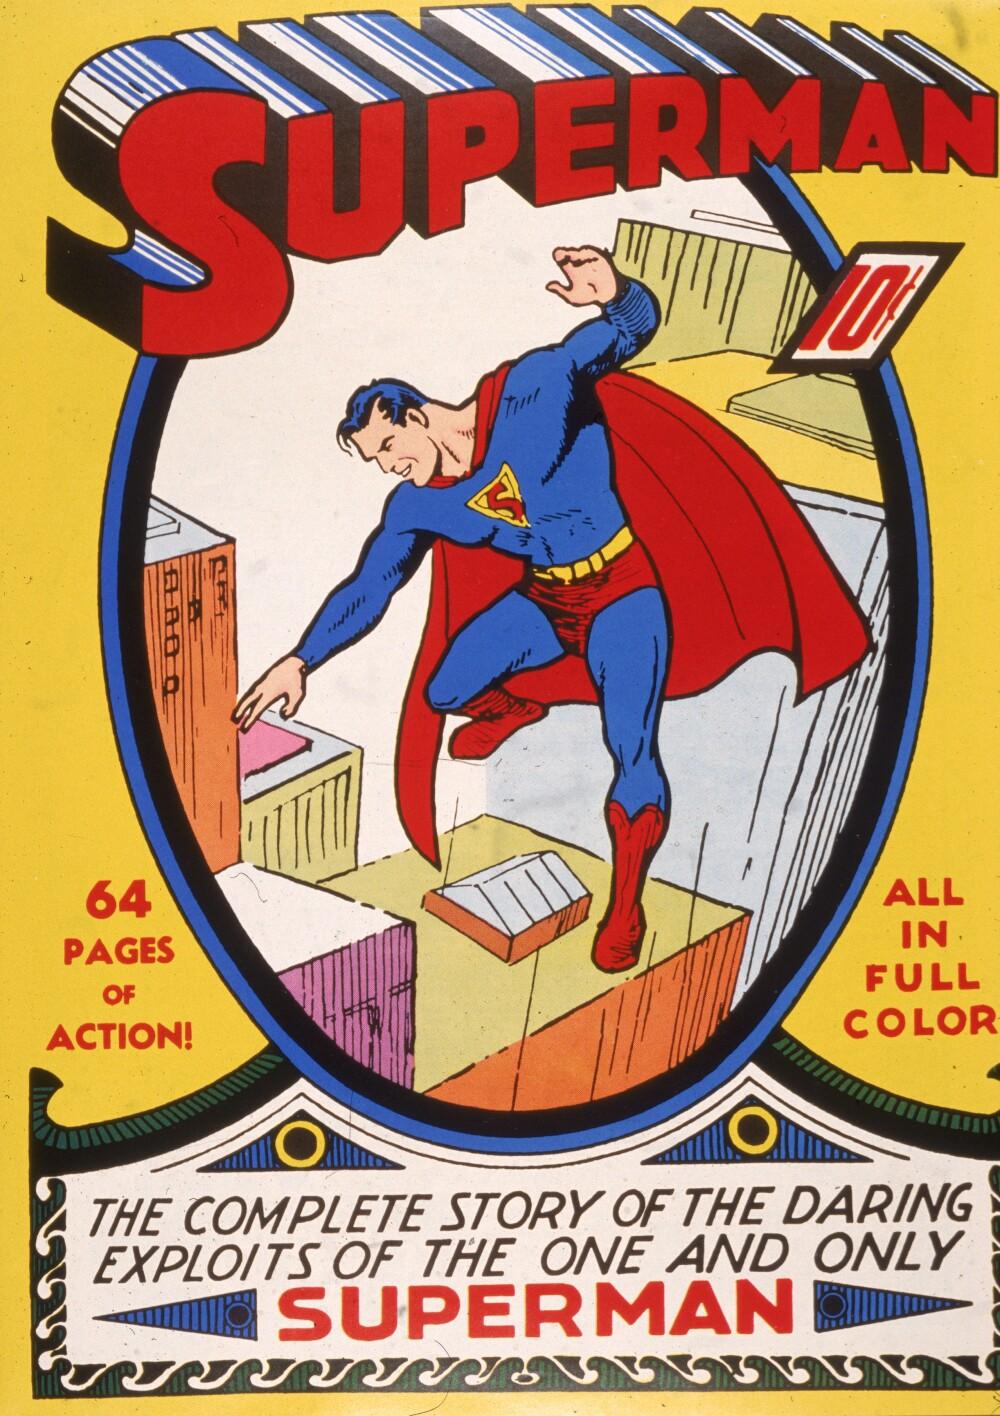 'Superman' Comic Book Cover